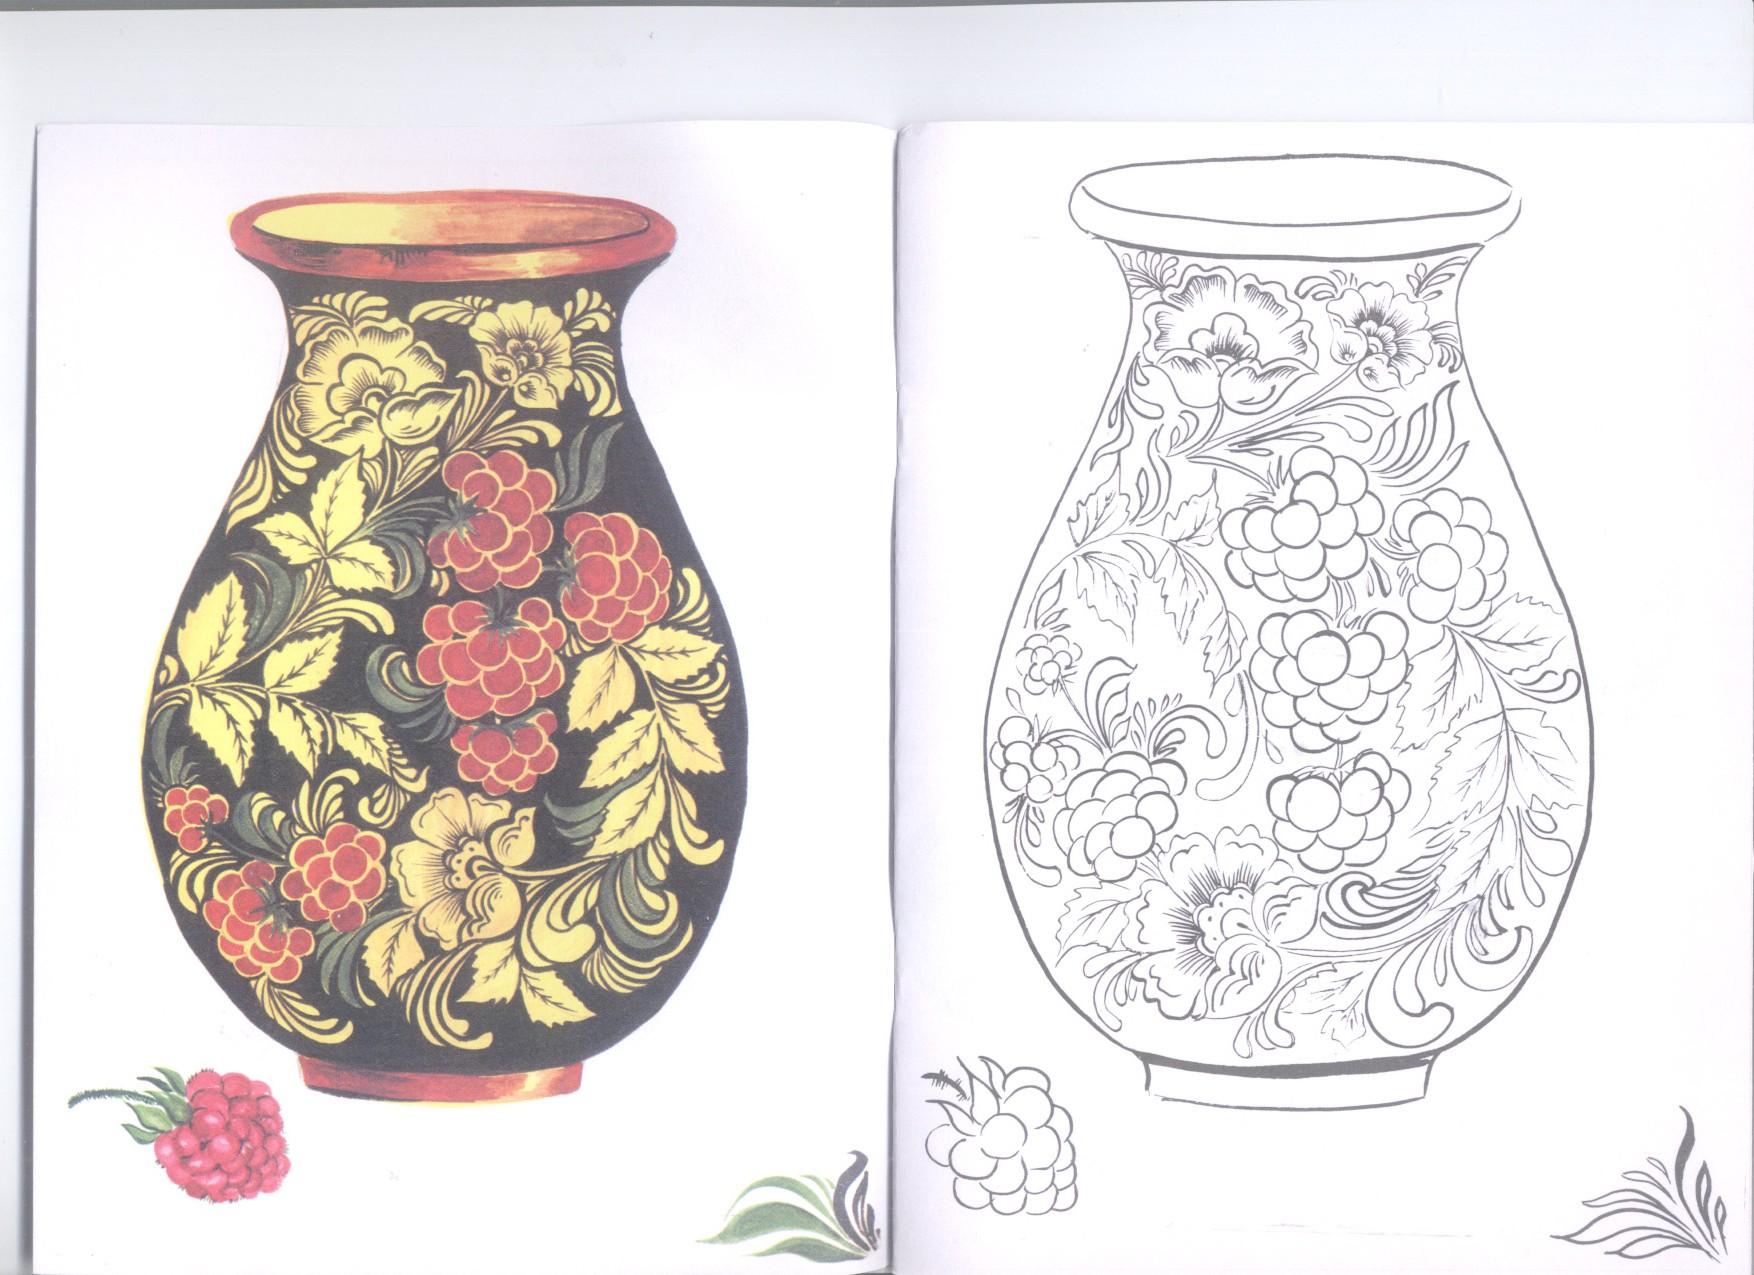 Декоративно прикладное искусство картинки рисунки рисовать